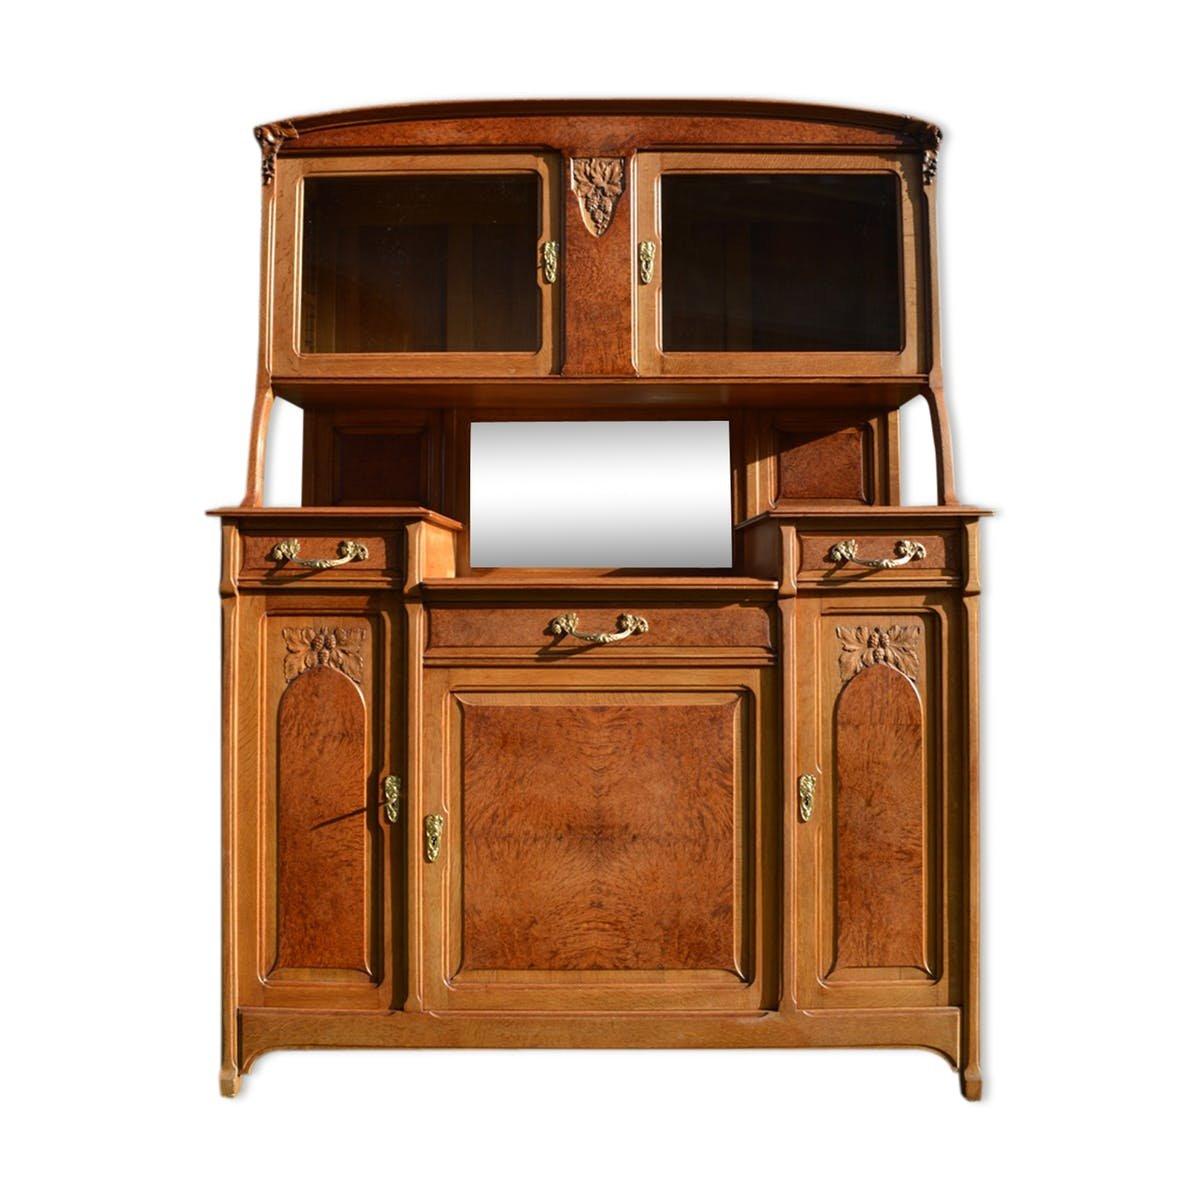 art nouveau 2 part buffet 1910s for sale at pamono. Black Bedroom Furniture Sets. Home Design Ideas